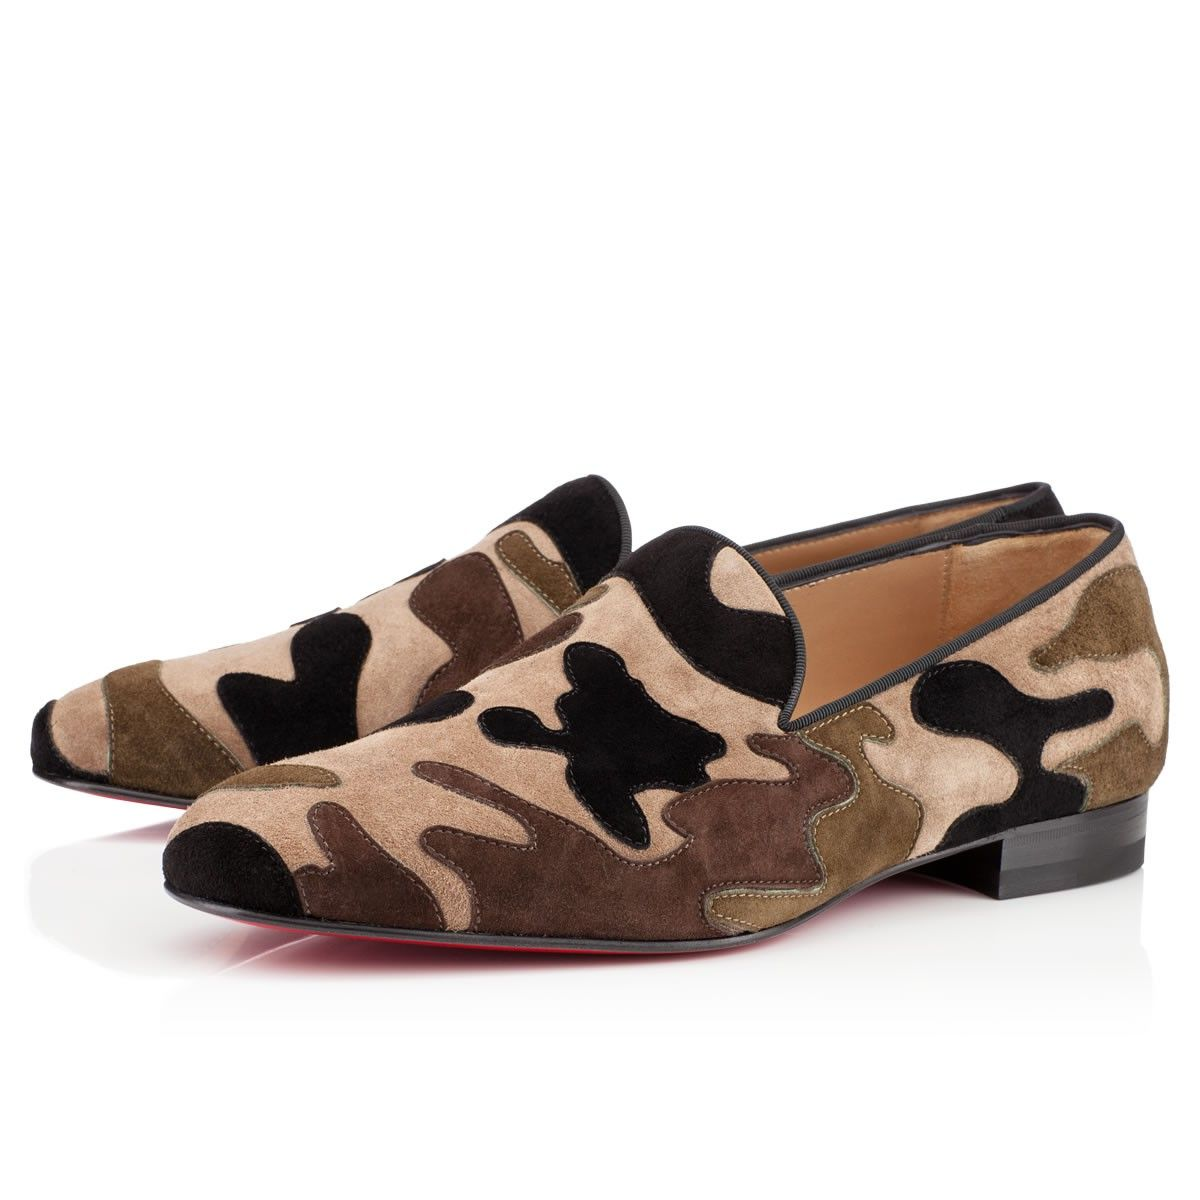 696cd893ad0d9 Christian Louboutin Mercenaire Loafers Camouflage | shoes Men ...